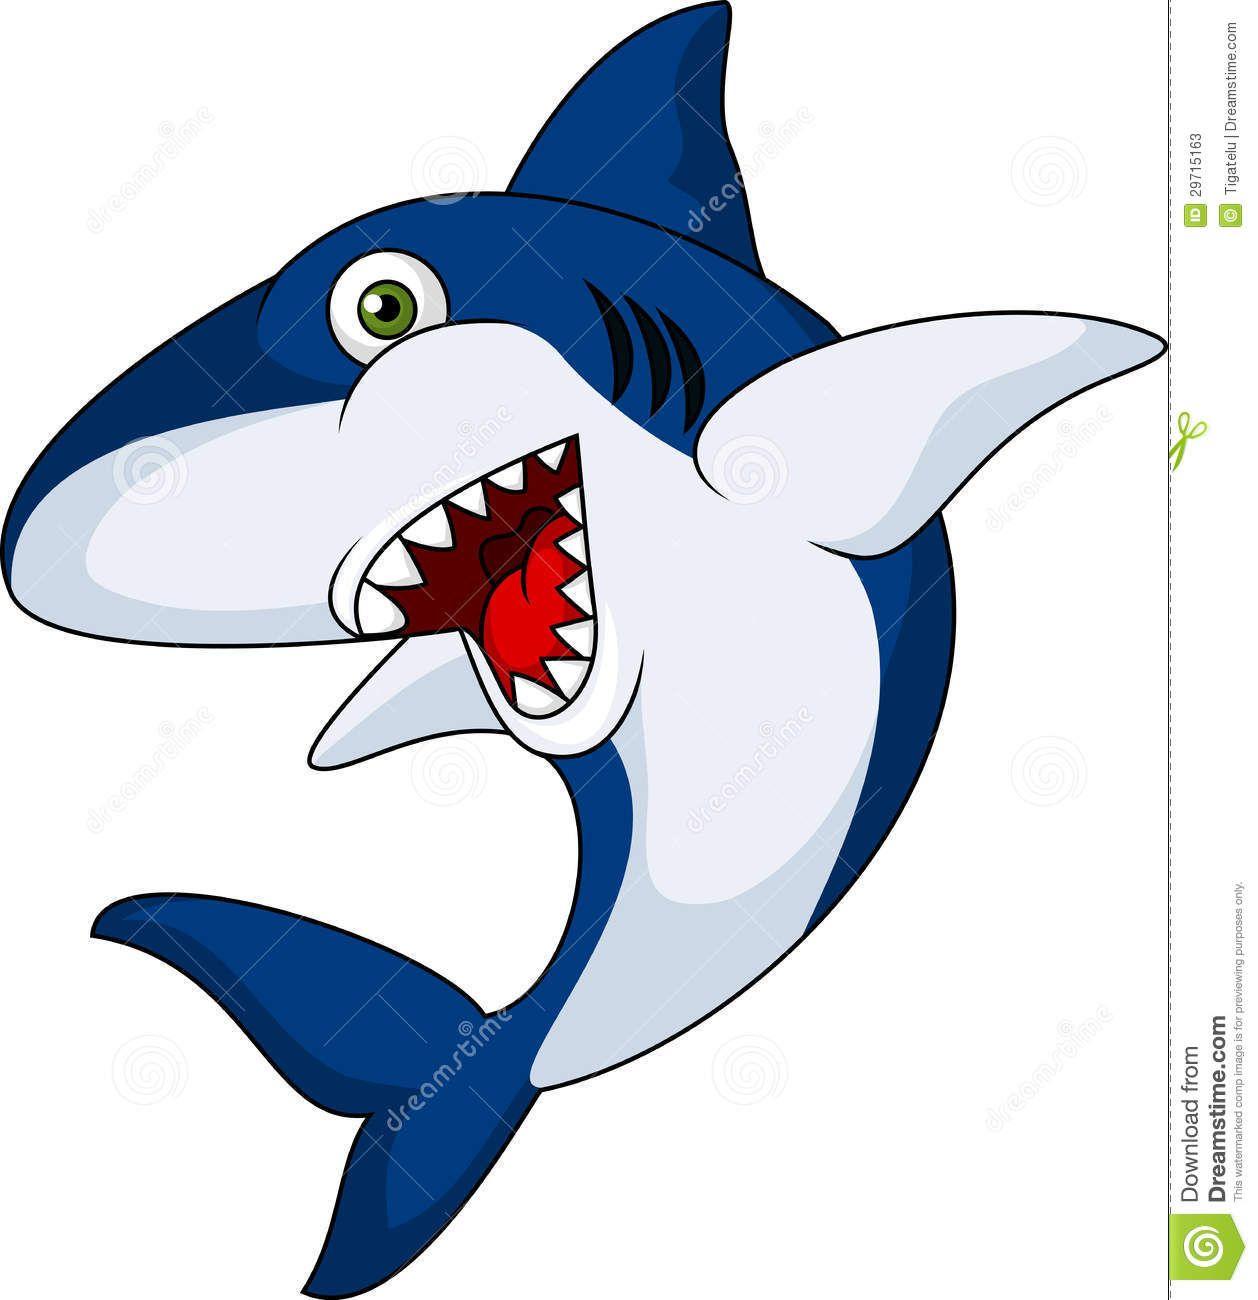 1258x1300 Cartoon Shark Images Cartoon Sharks Clipart Shark Cartoon